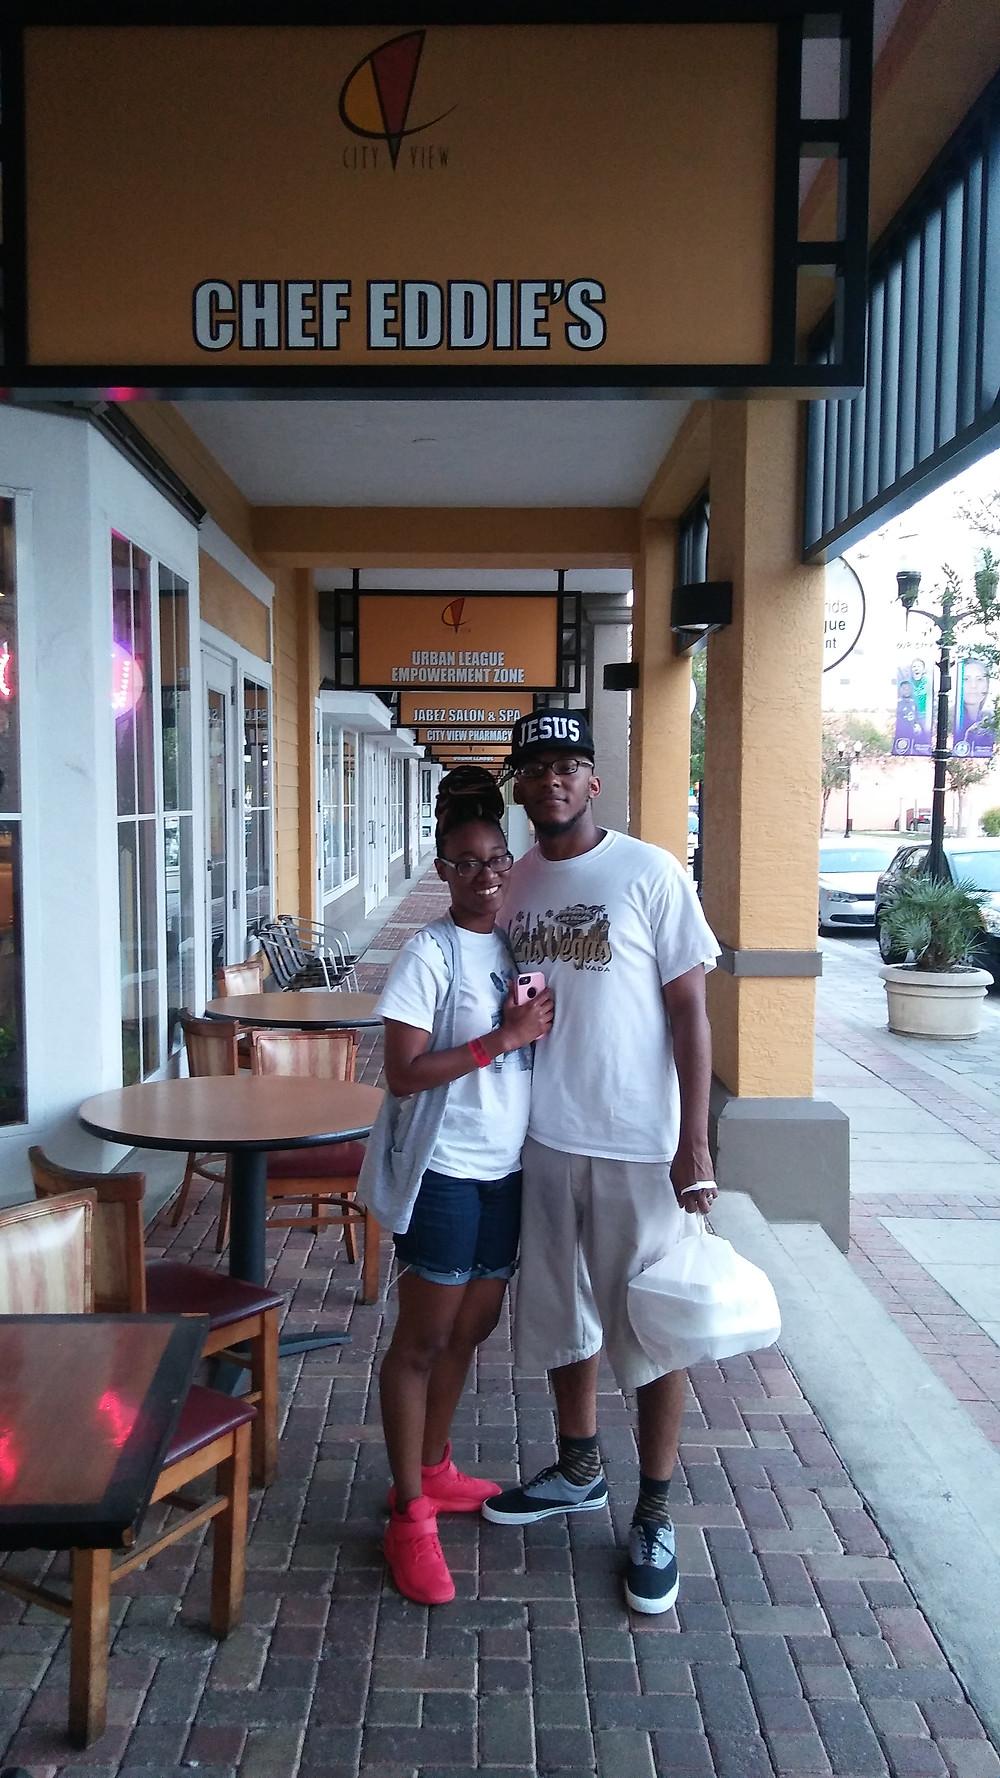 Demetre' and Iyana